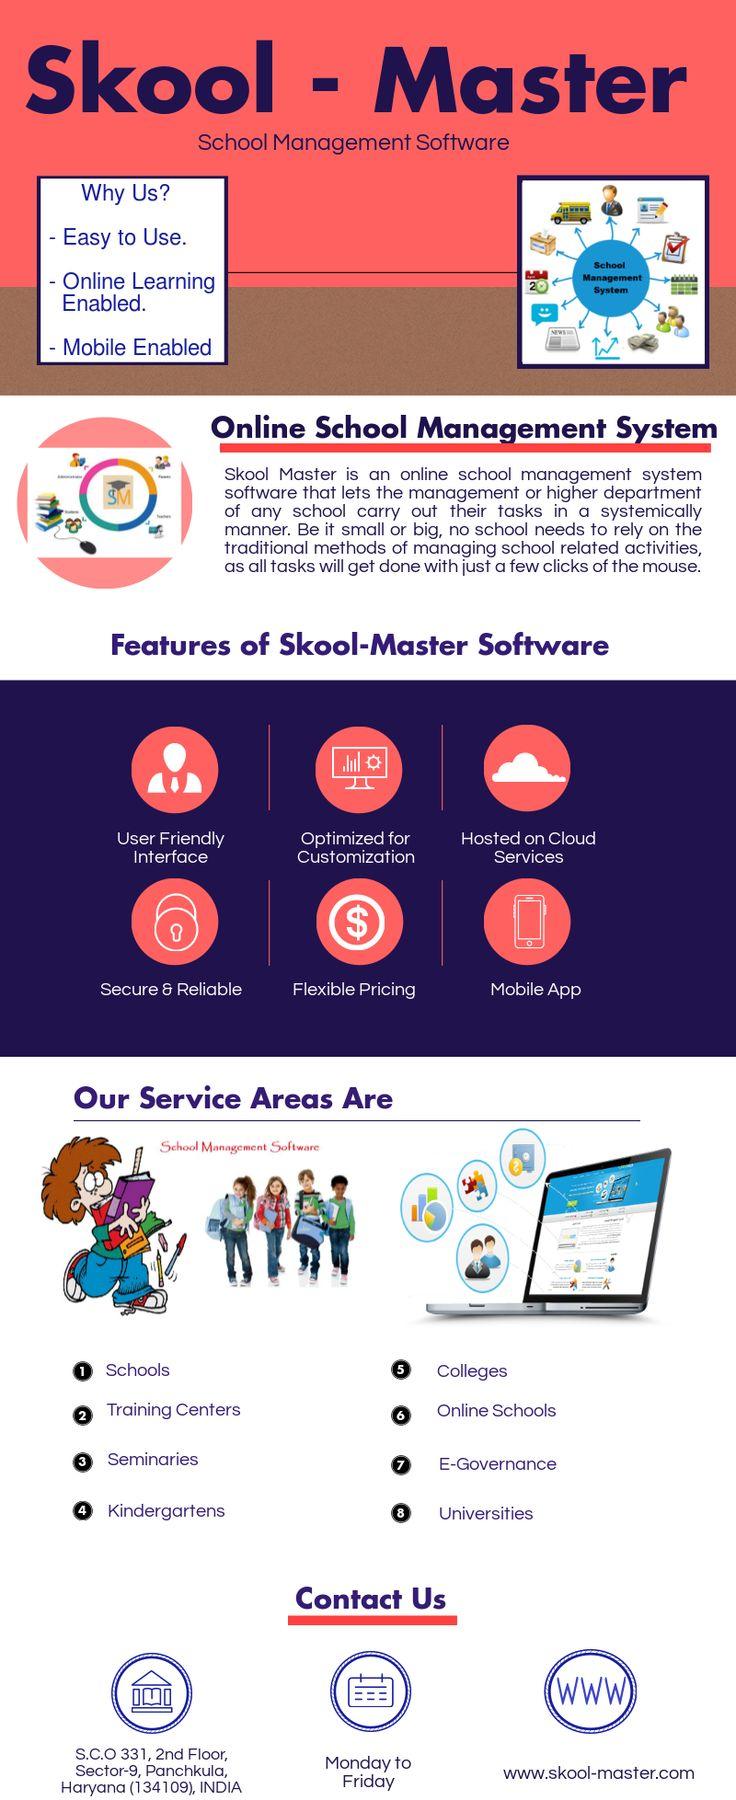 Technology Management Image: 17 Best Images About Online School Management System On